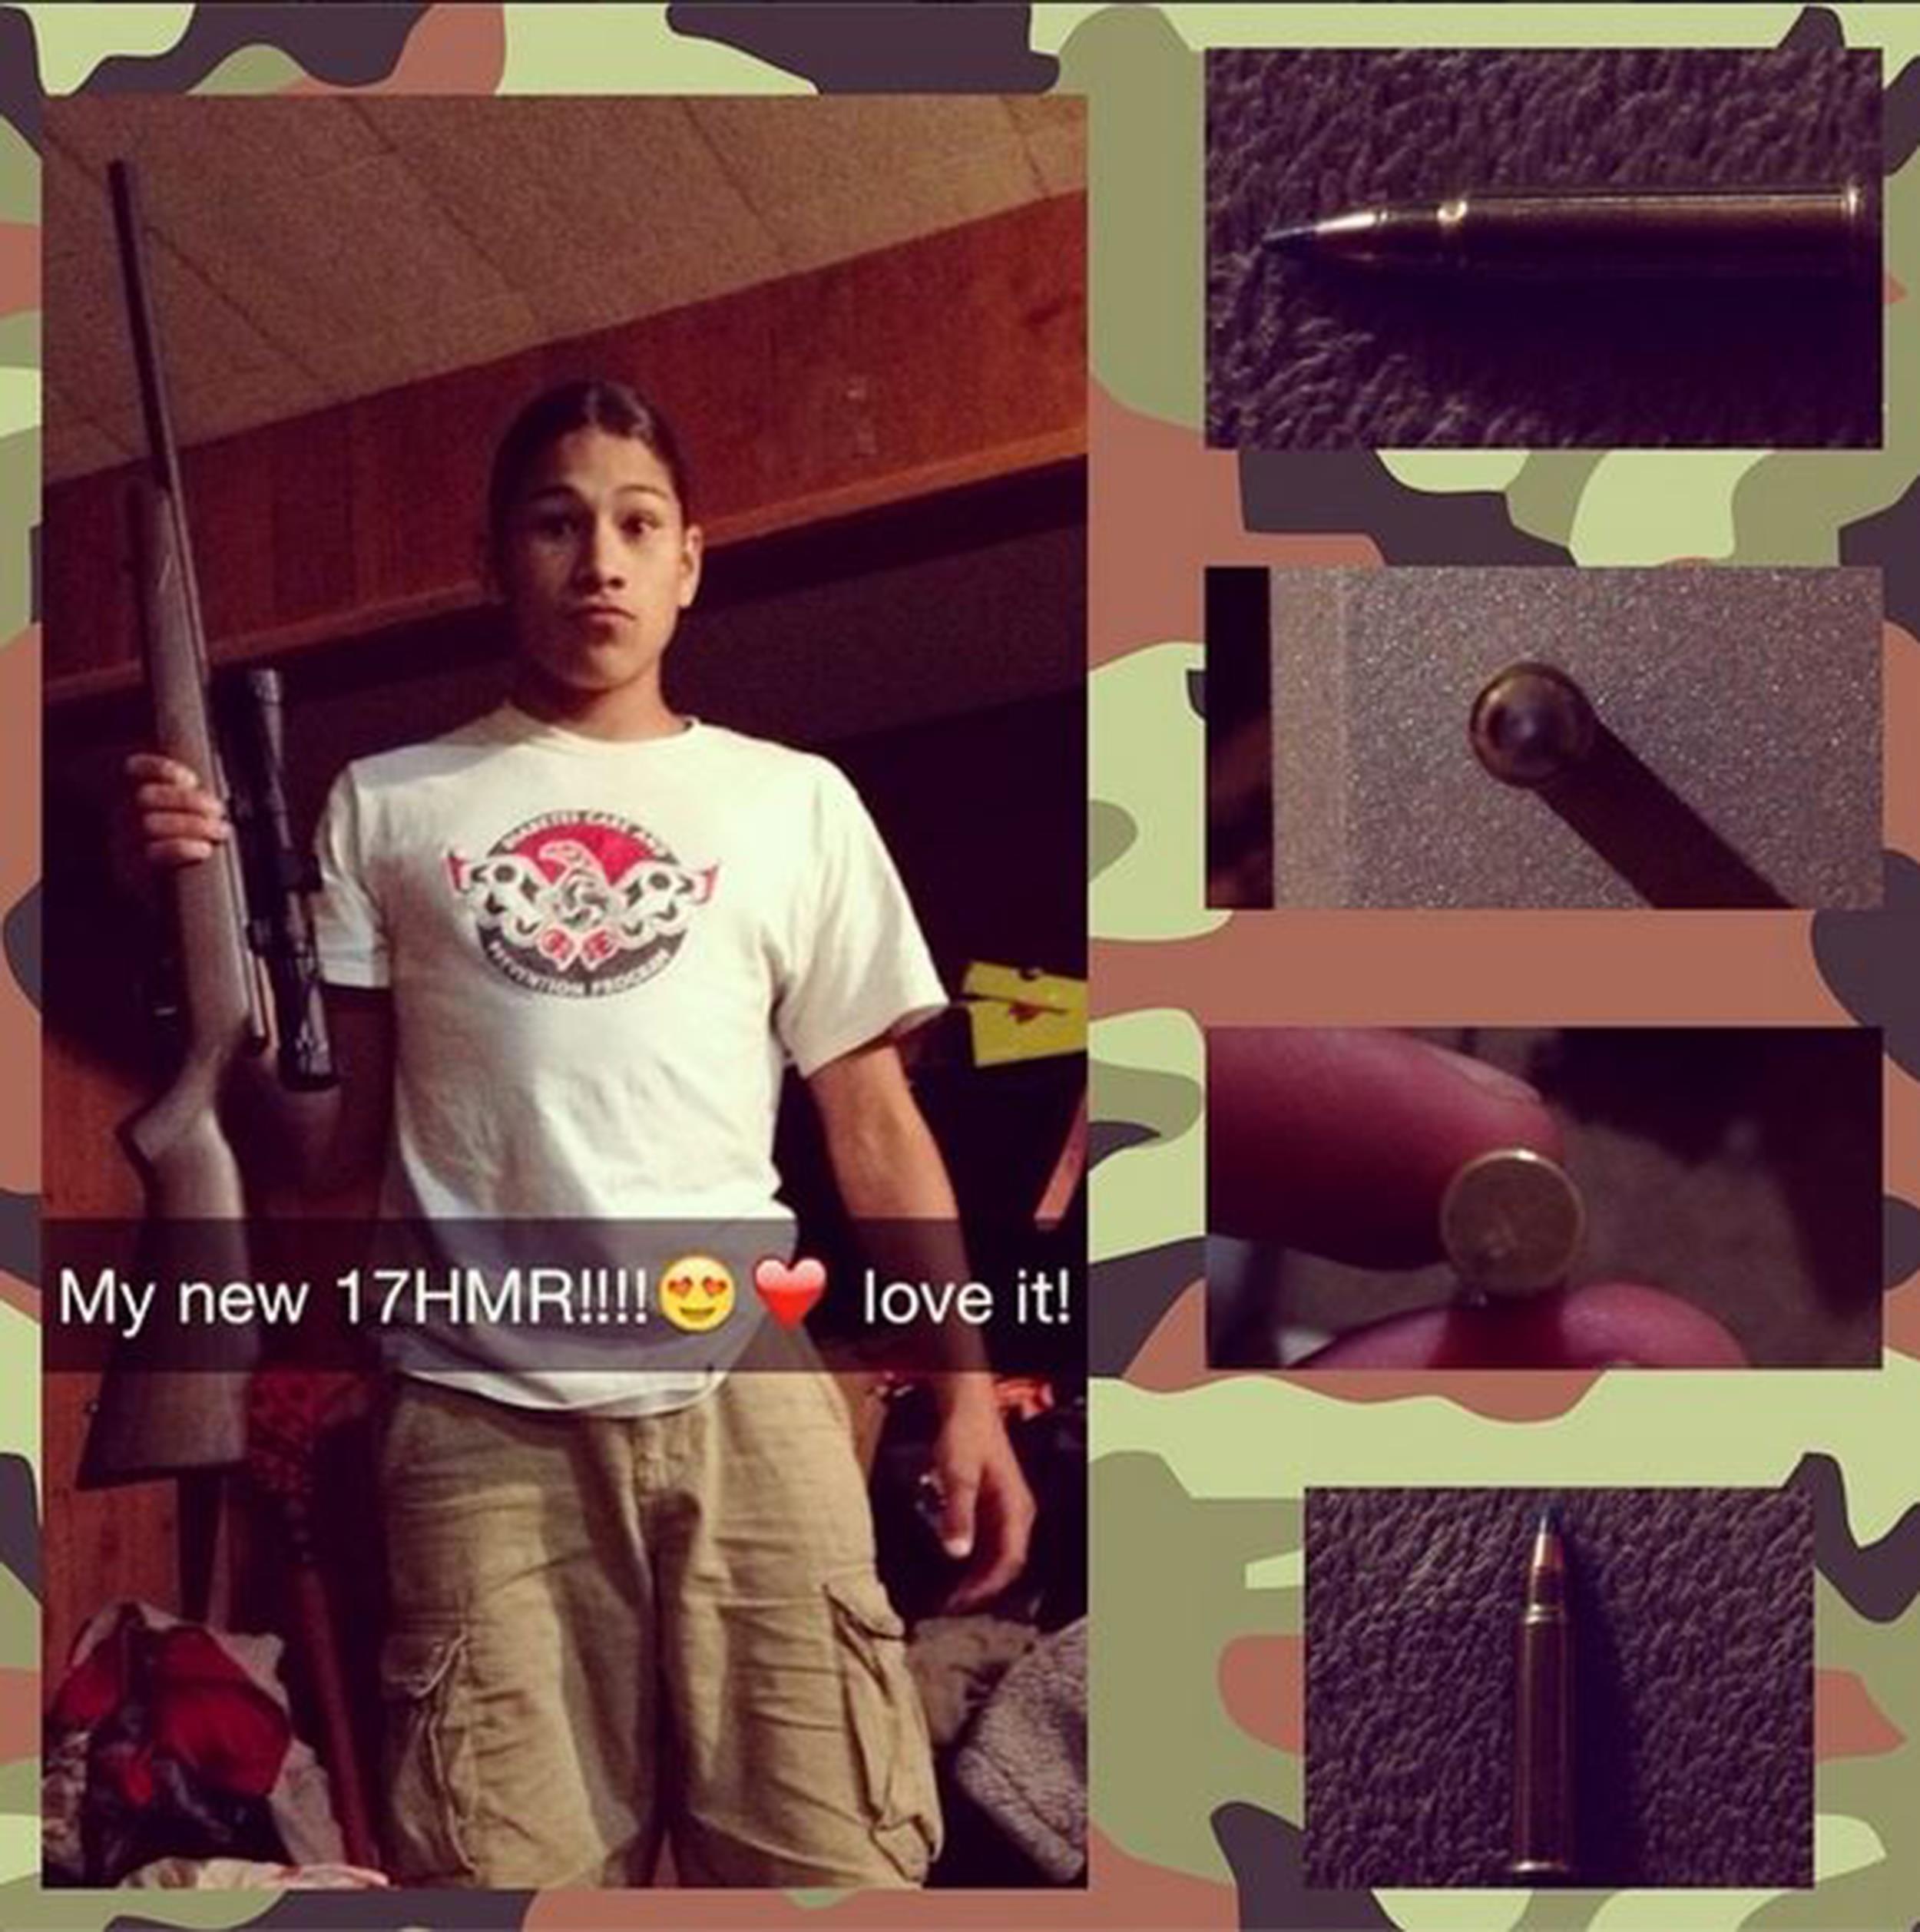 'He Seemed Like A Normal Kid': Rage Behind Washington Gunman's Spree